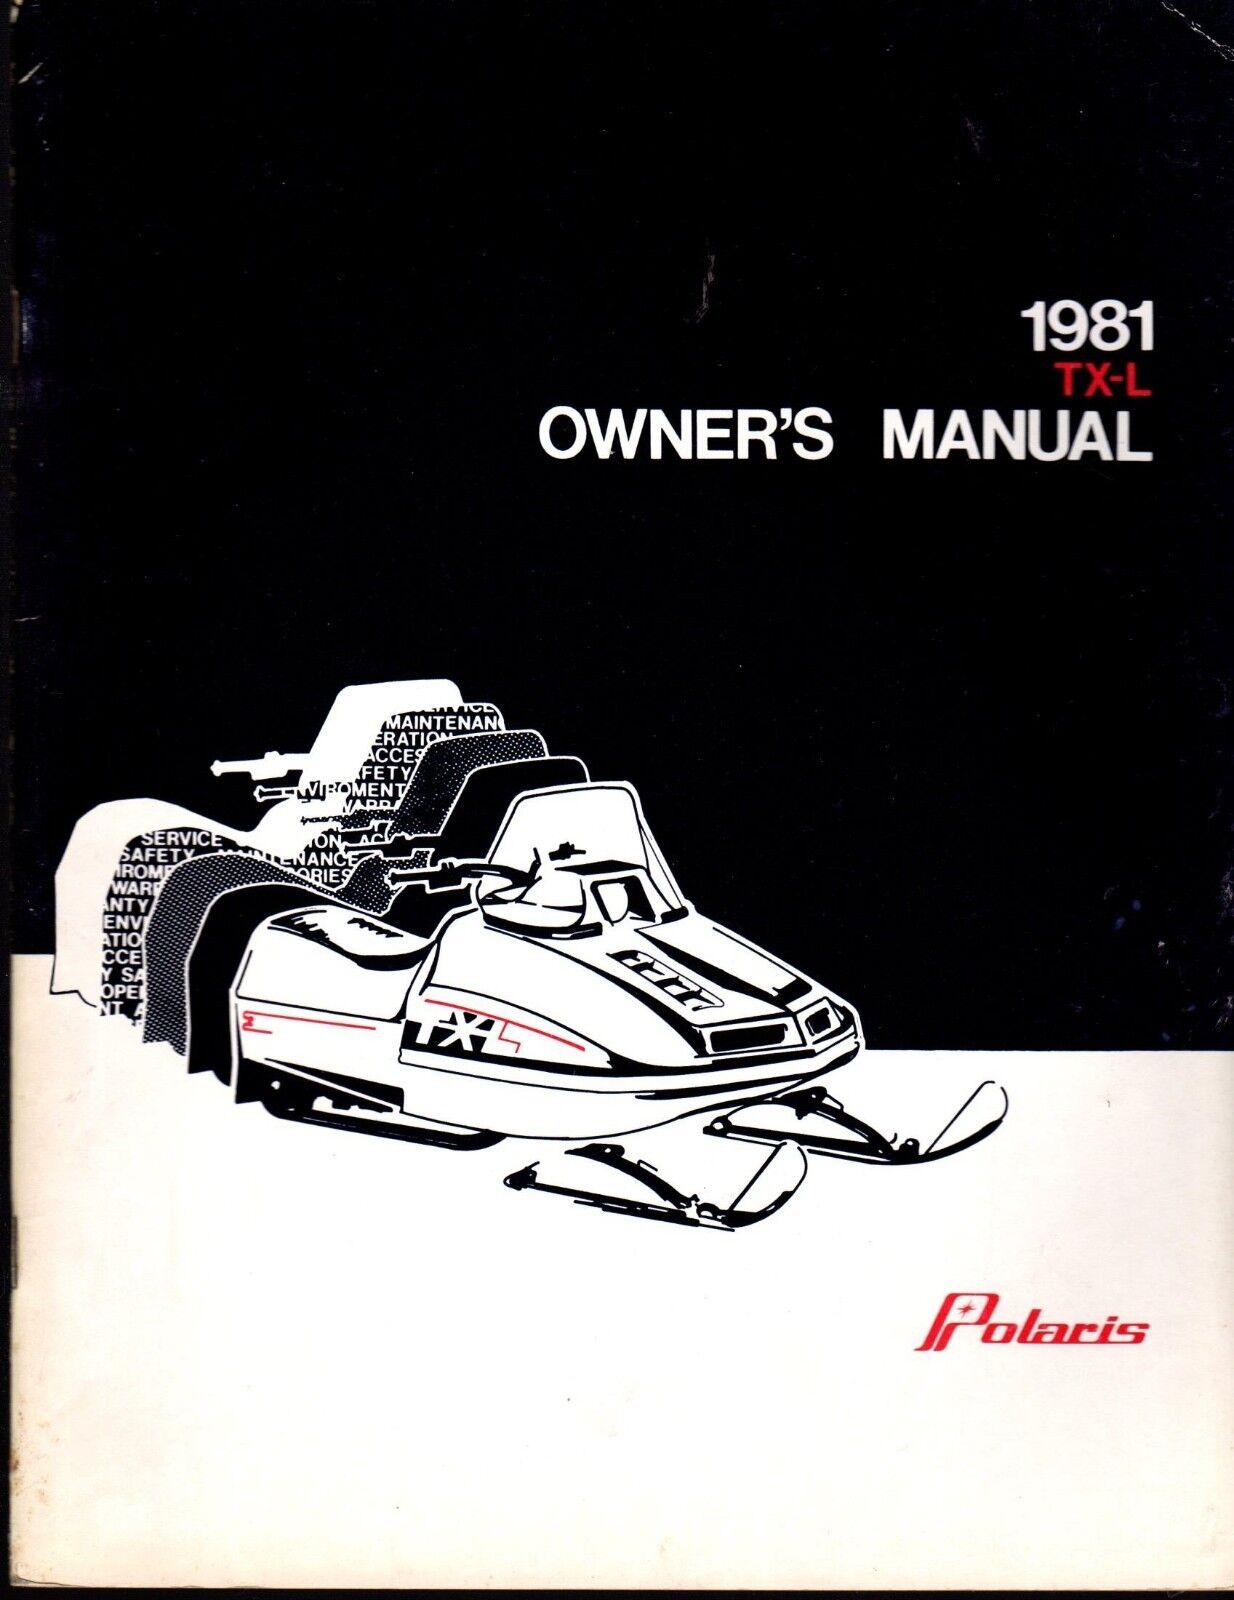 VINTAGE 1981 POLARIS TX-L SNOWMOBILE OWNERS MANUAL NEW P N 9910679  (417)